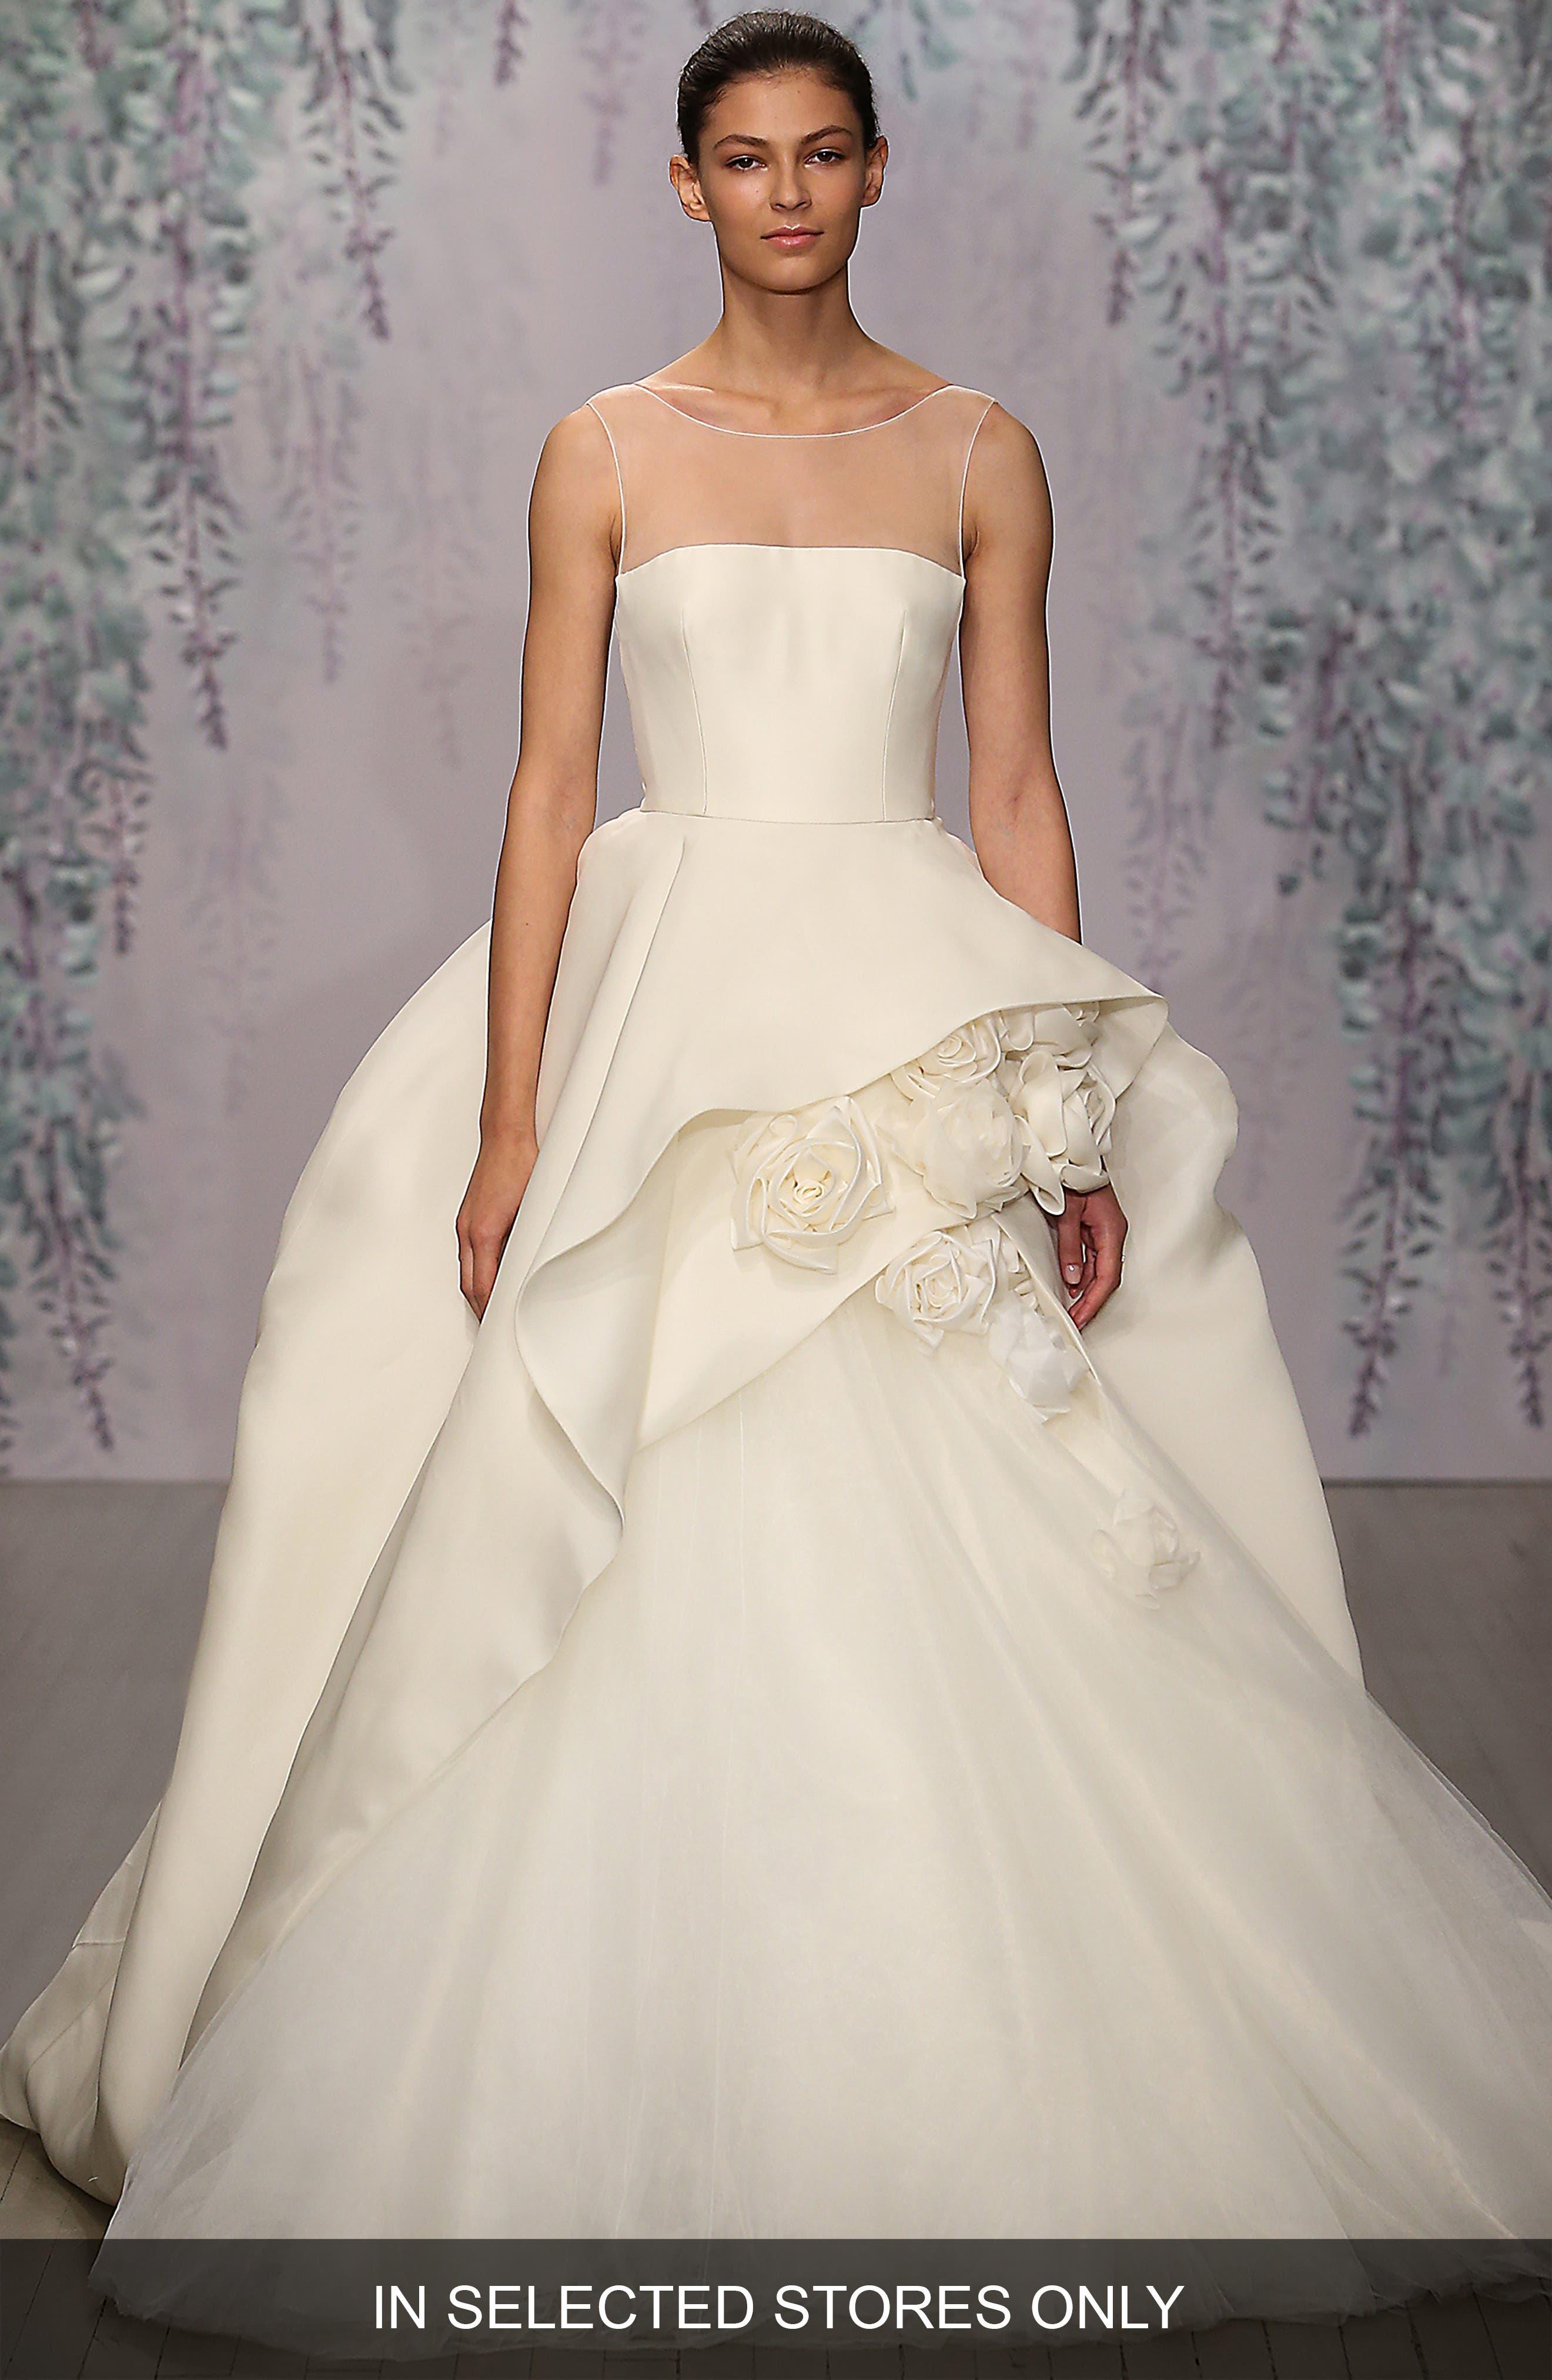 Monique Lhuillier Rosette Detail Silk Ballgown Dress